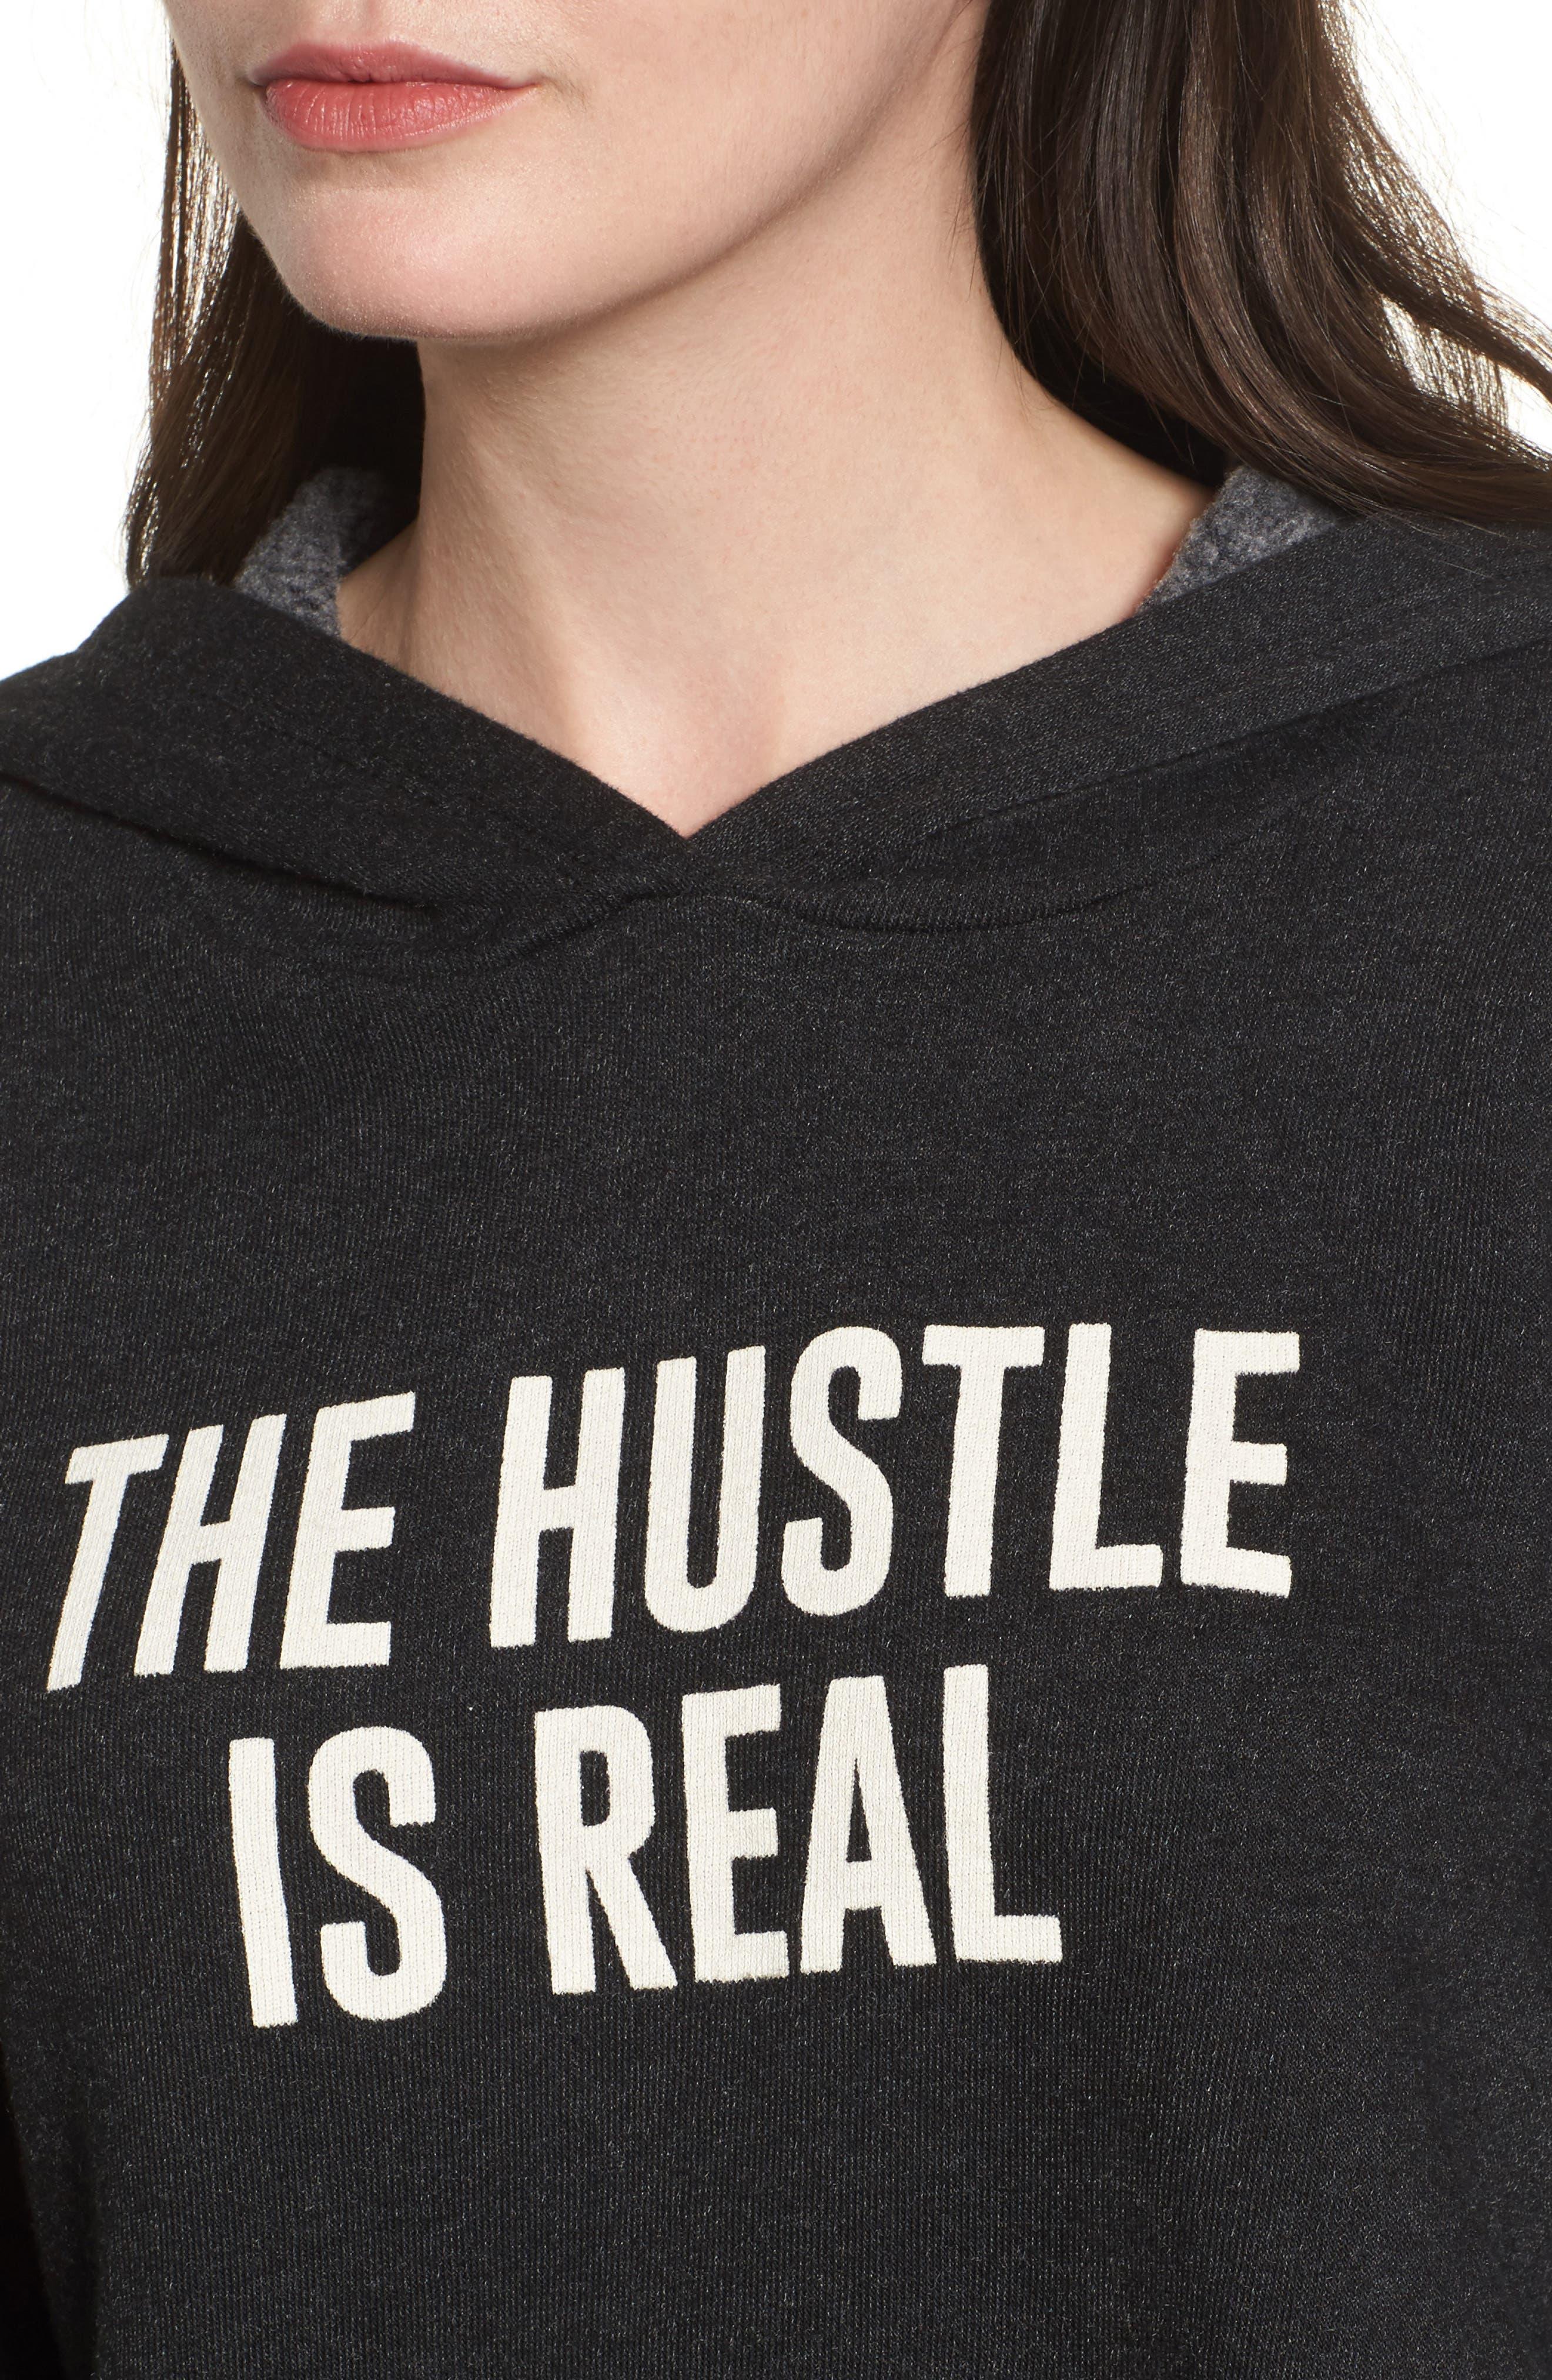 The Hustle is Real Hoodie,                             Alternate thumbnail 4, color,                             Black